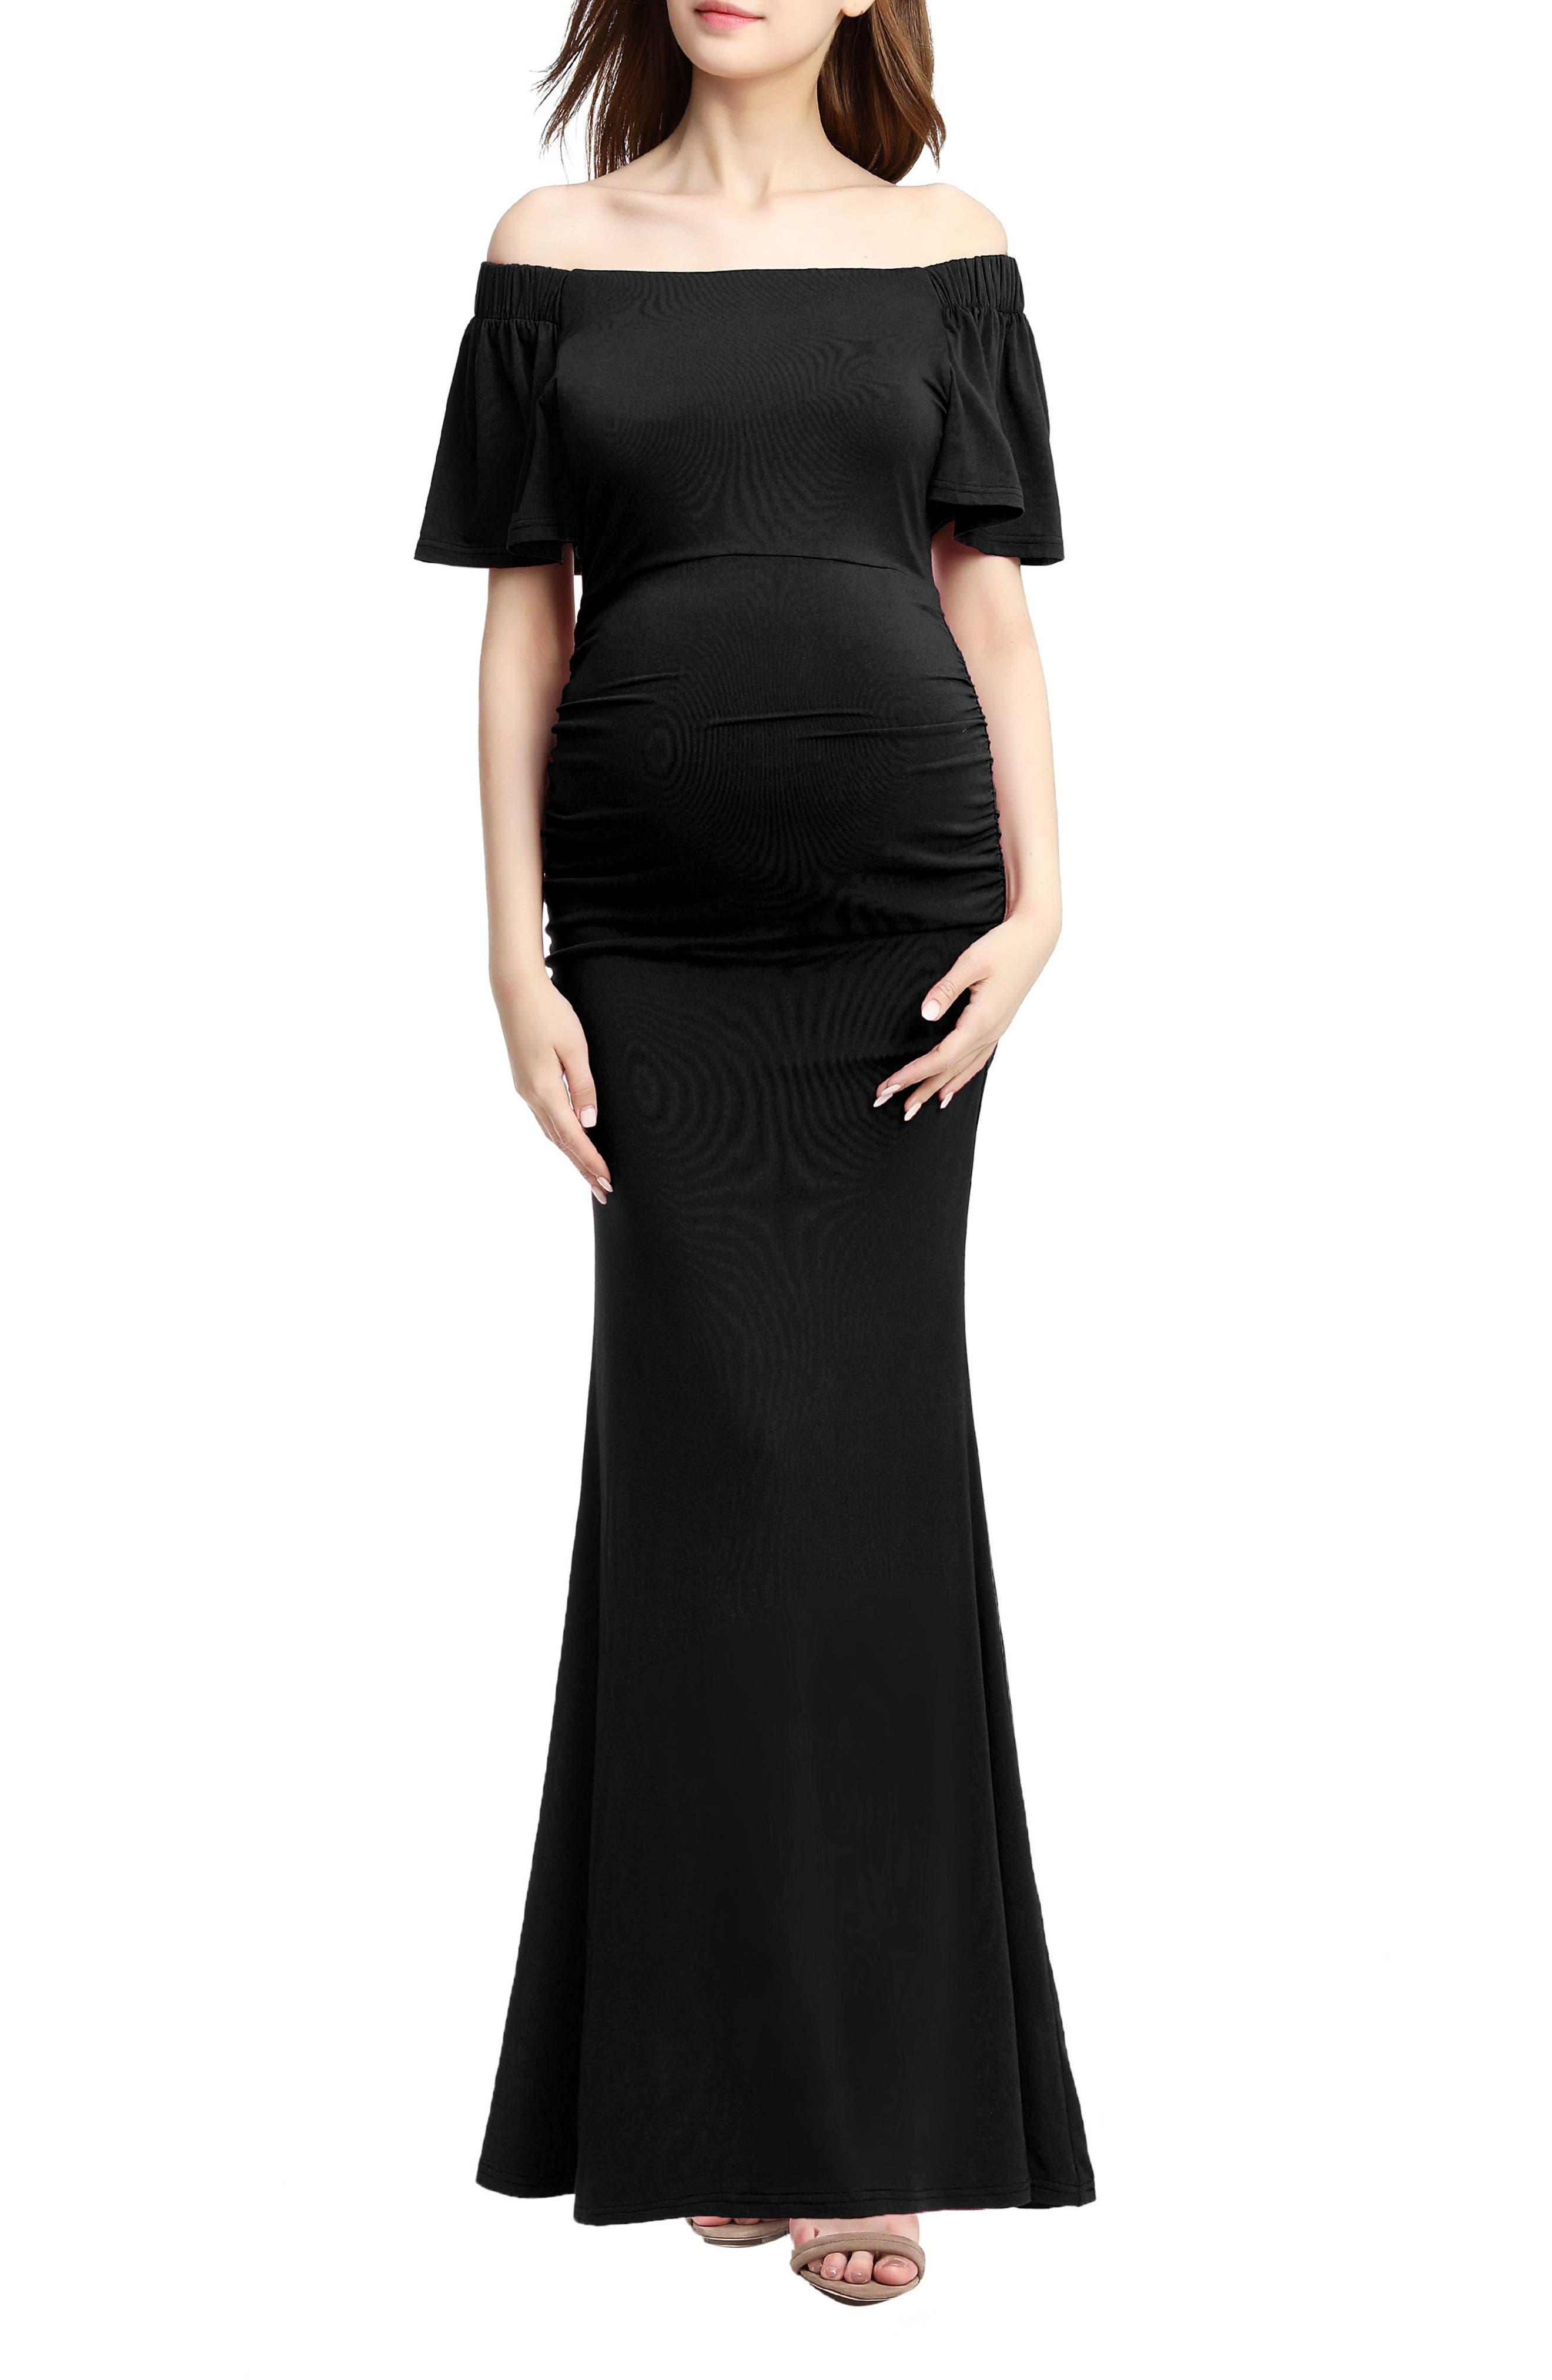 Kimi And Kai Abigail Off The Shoulder Maternity Dress, Black